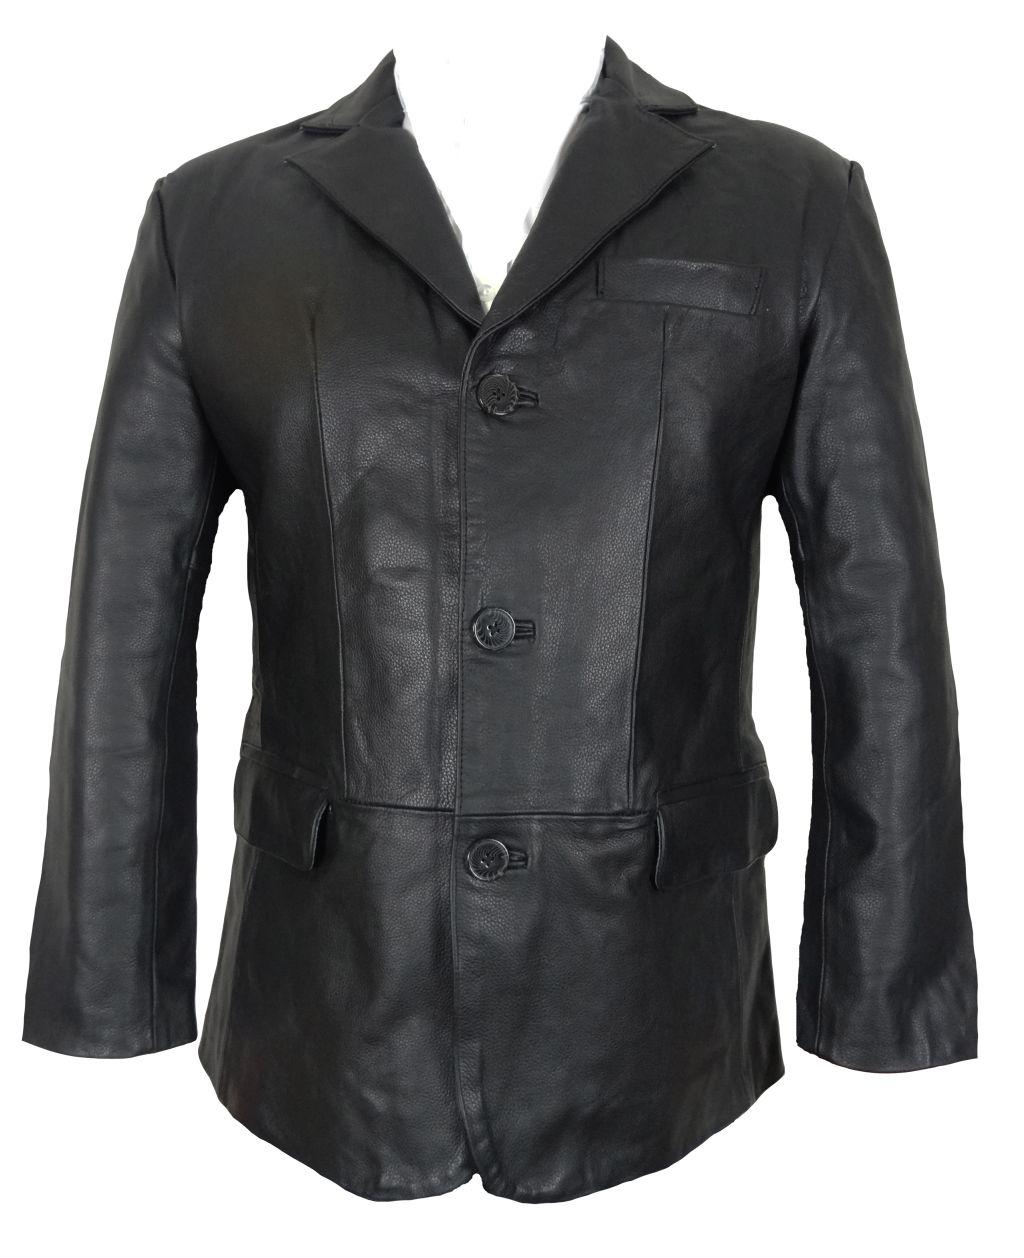 bangla 1403 jacke blazer lederjacke herren sakko schwarz m 6 xl. Black Bedroom Furniture Sets. Home Design Ideas